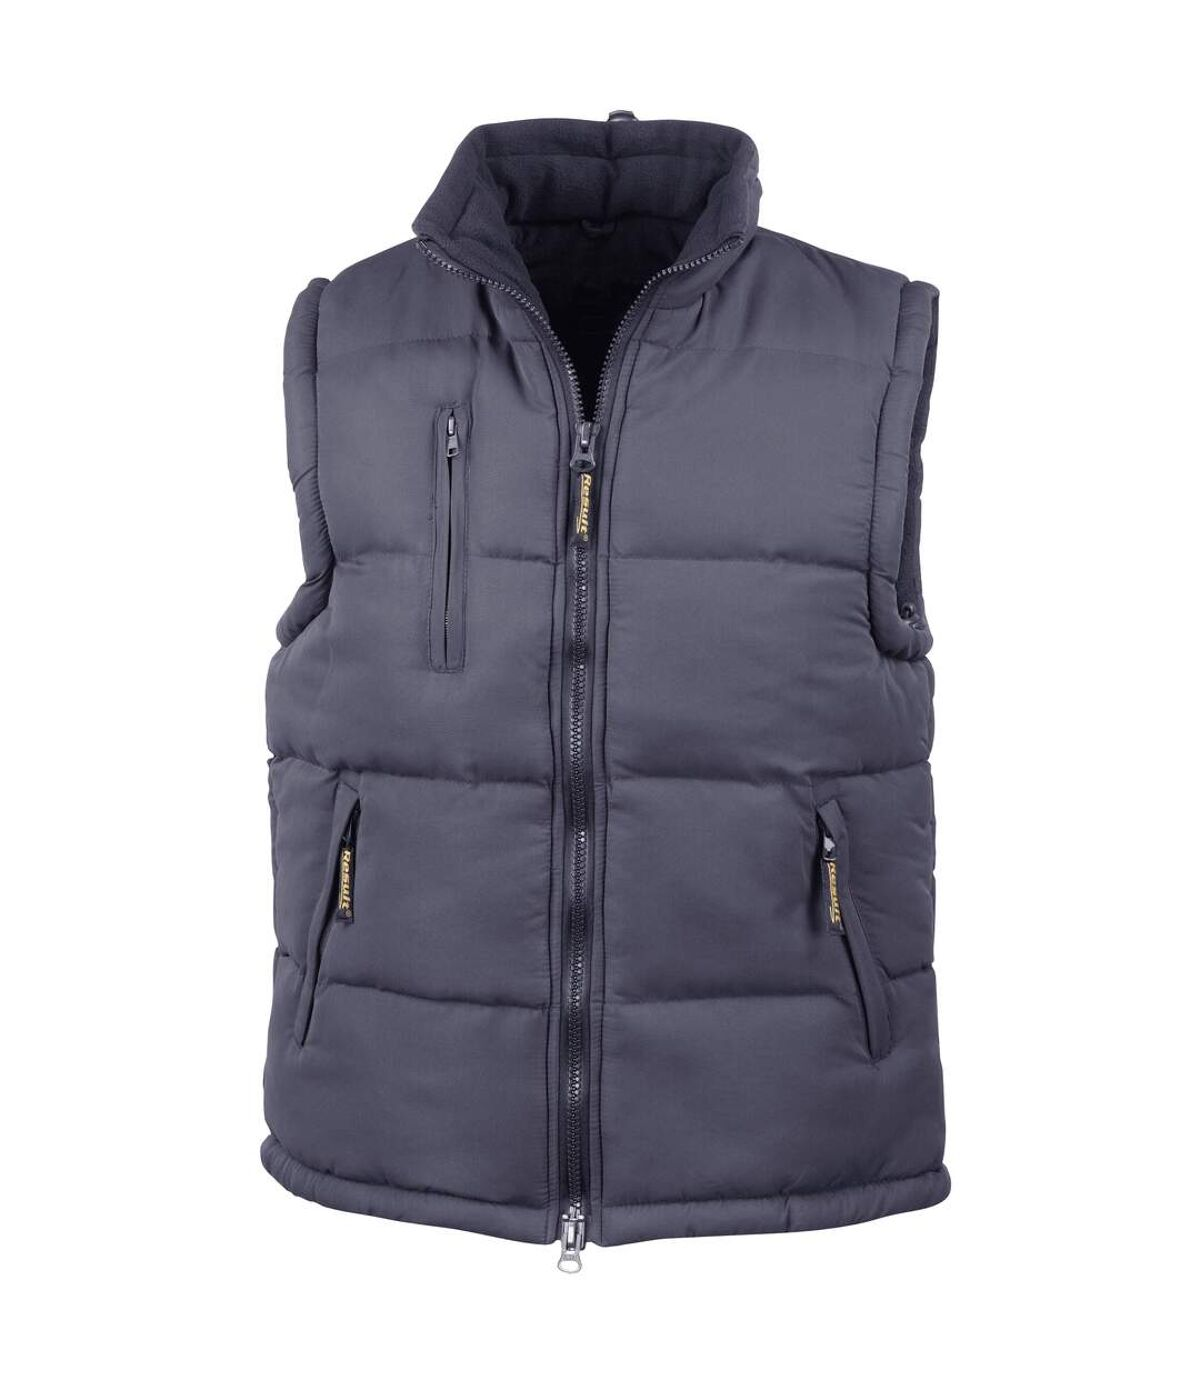 Result Mens Ultra Padded Bodywarmer Water Repellent Windproof Jacket (Navy Blue) - UTBC936